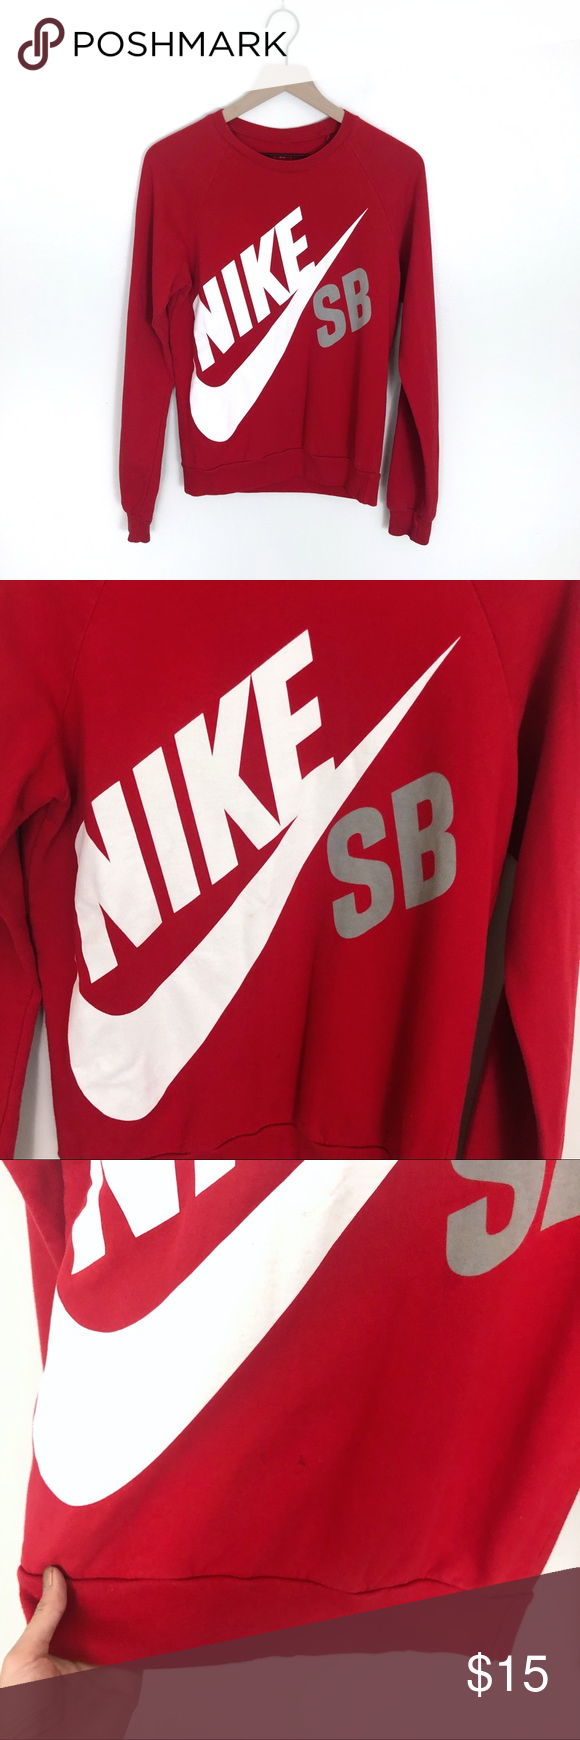 Predownload: Nike Sb Red Crewneck Logo Sweater Red Crewneck Sweaters Nike Sb Red [ 1740 x 580 Pixel ]